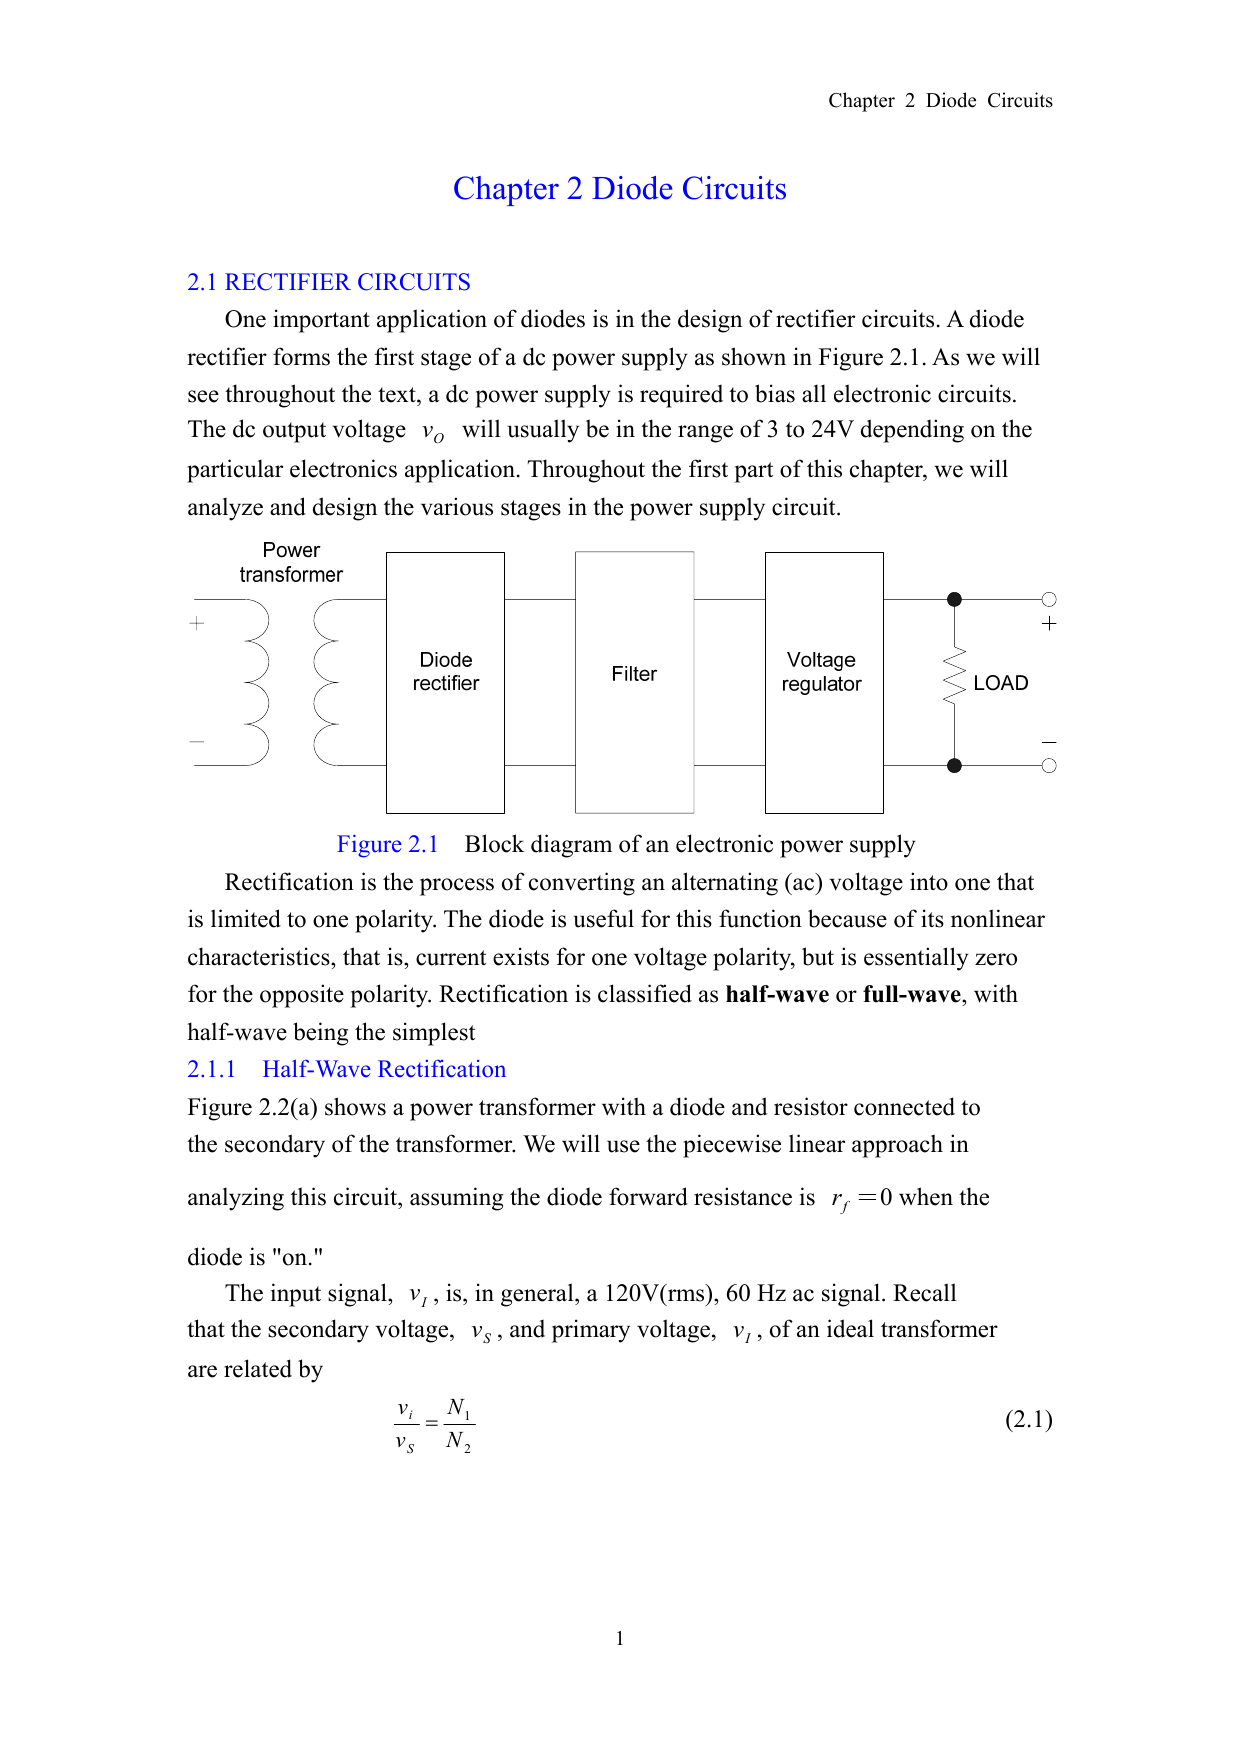 Chapter 2 Diode Circuits And Its Characteristics Electronic Diagram 017909424 1 4c04e1a0df0e3e41fcf5a3bb5c8f6432